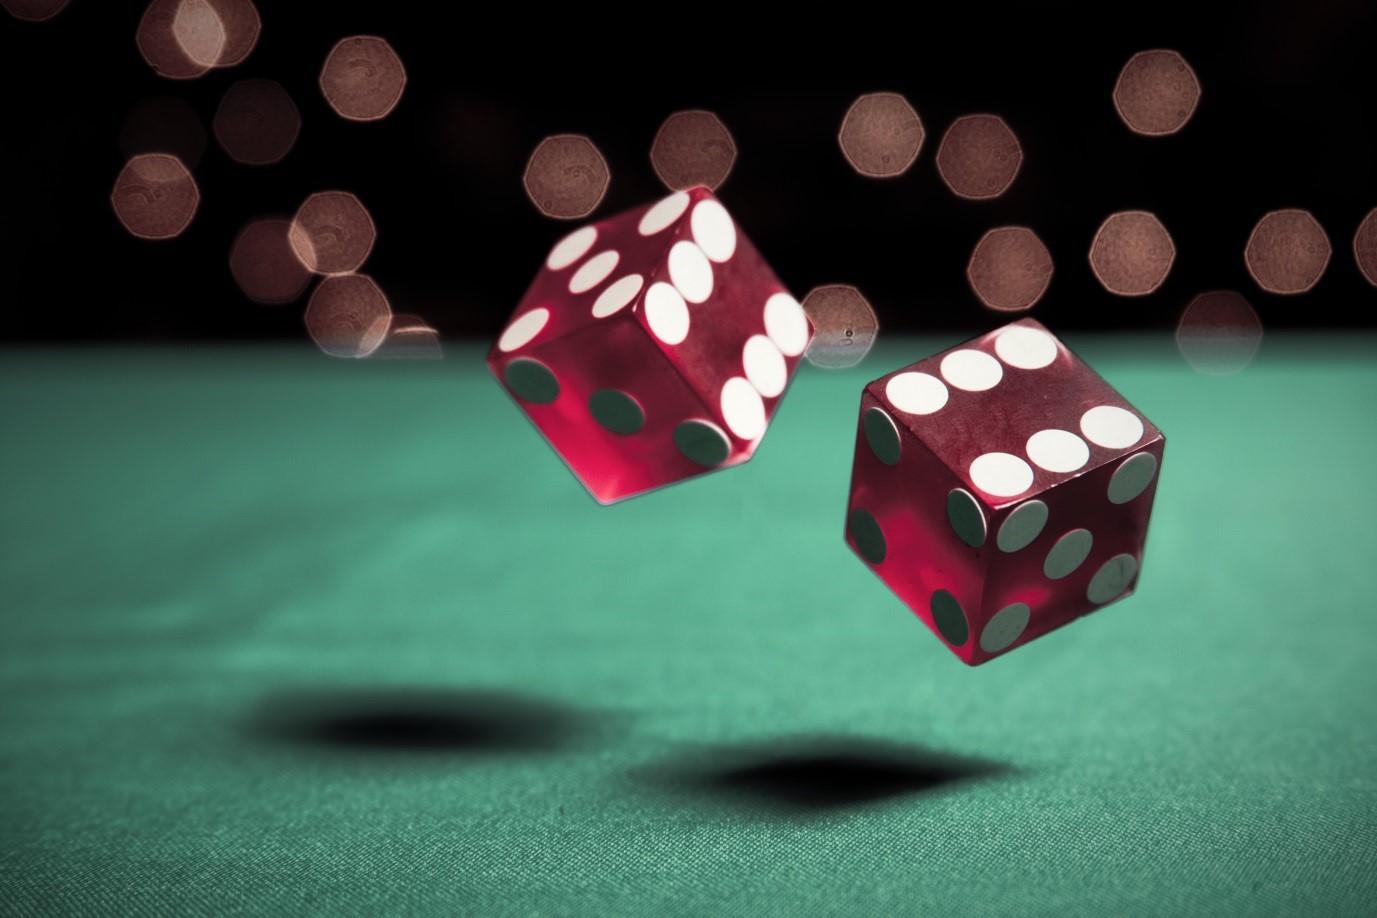 gambling games on steam